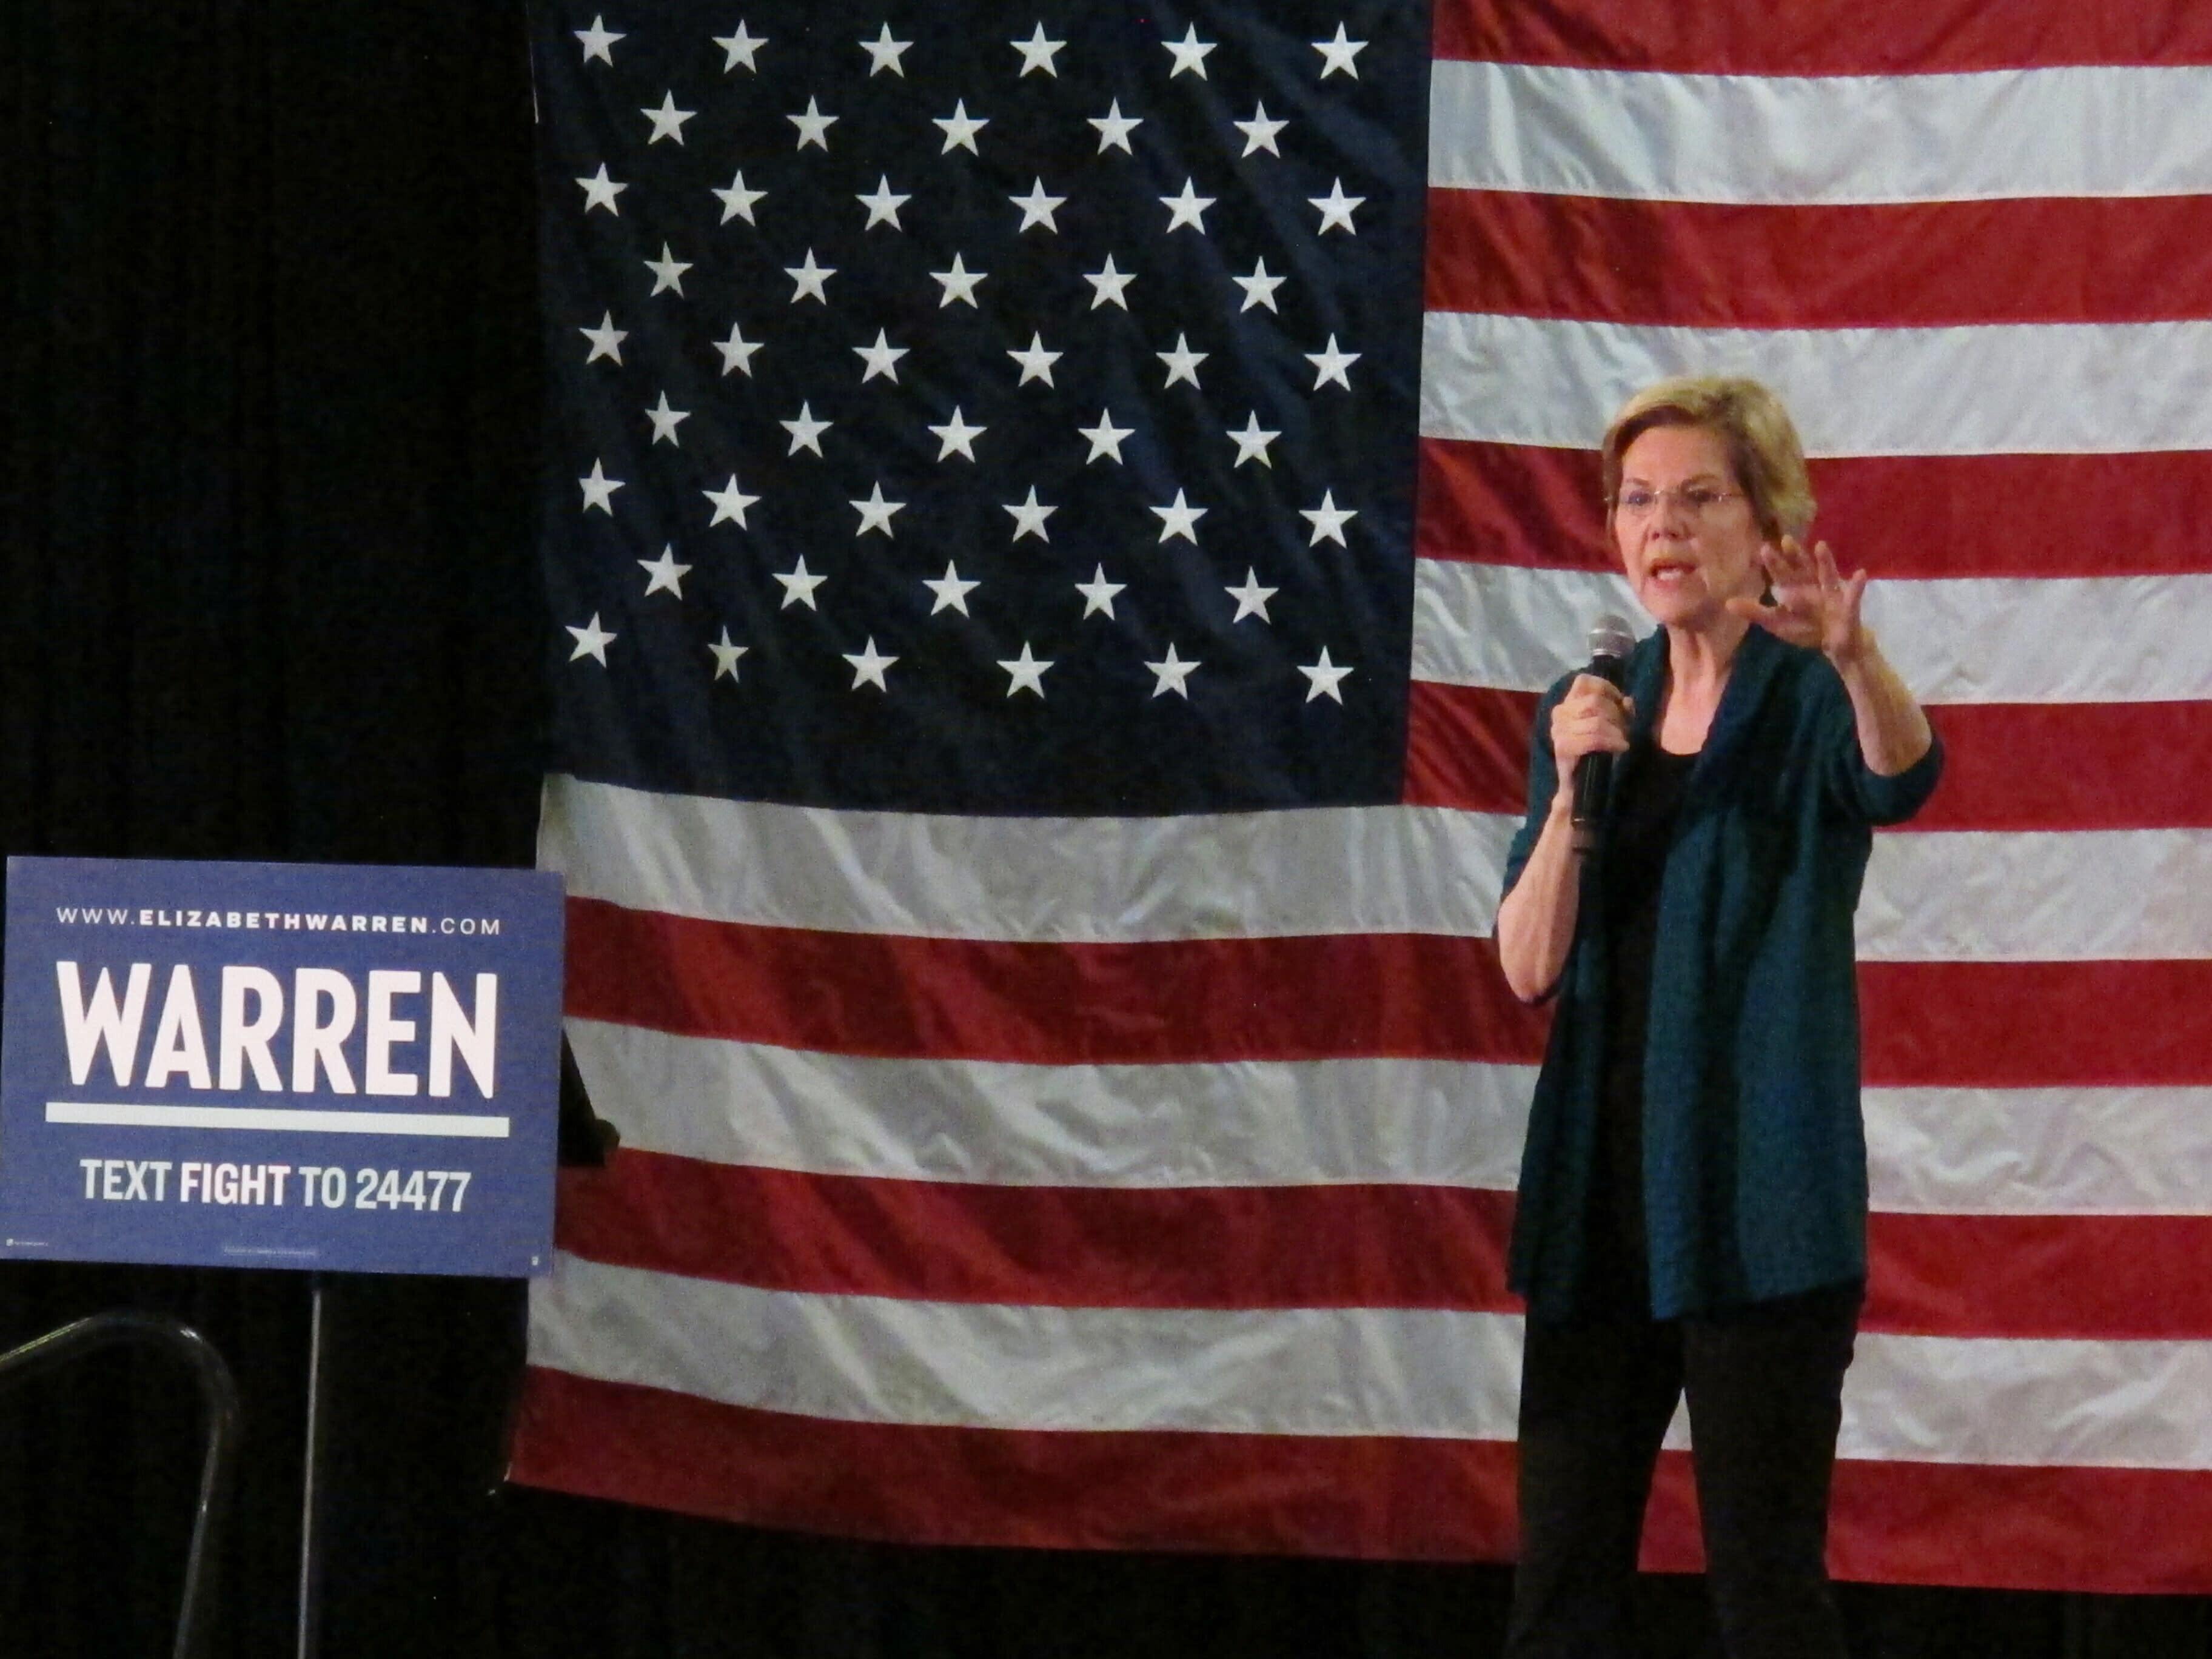 2020 Democrats' new litmus test: Abolish Electoral College